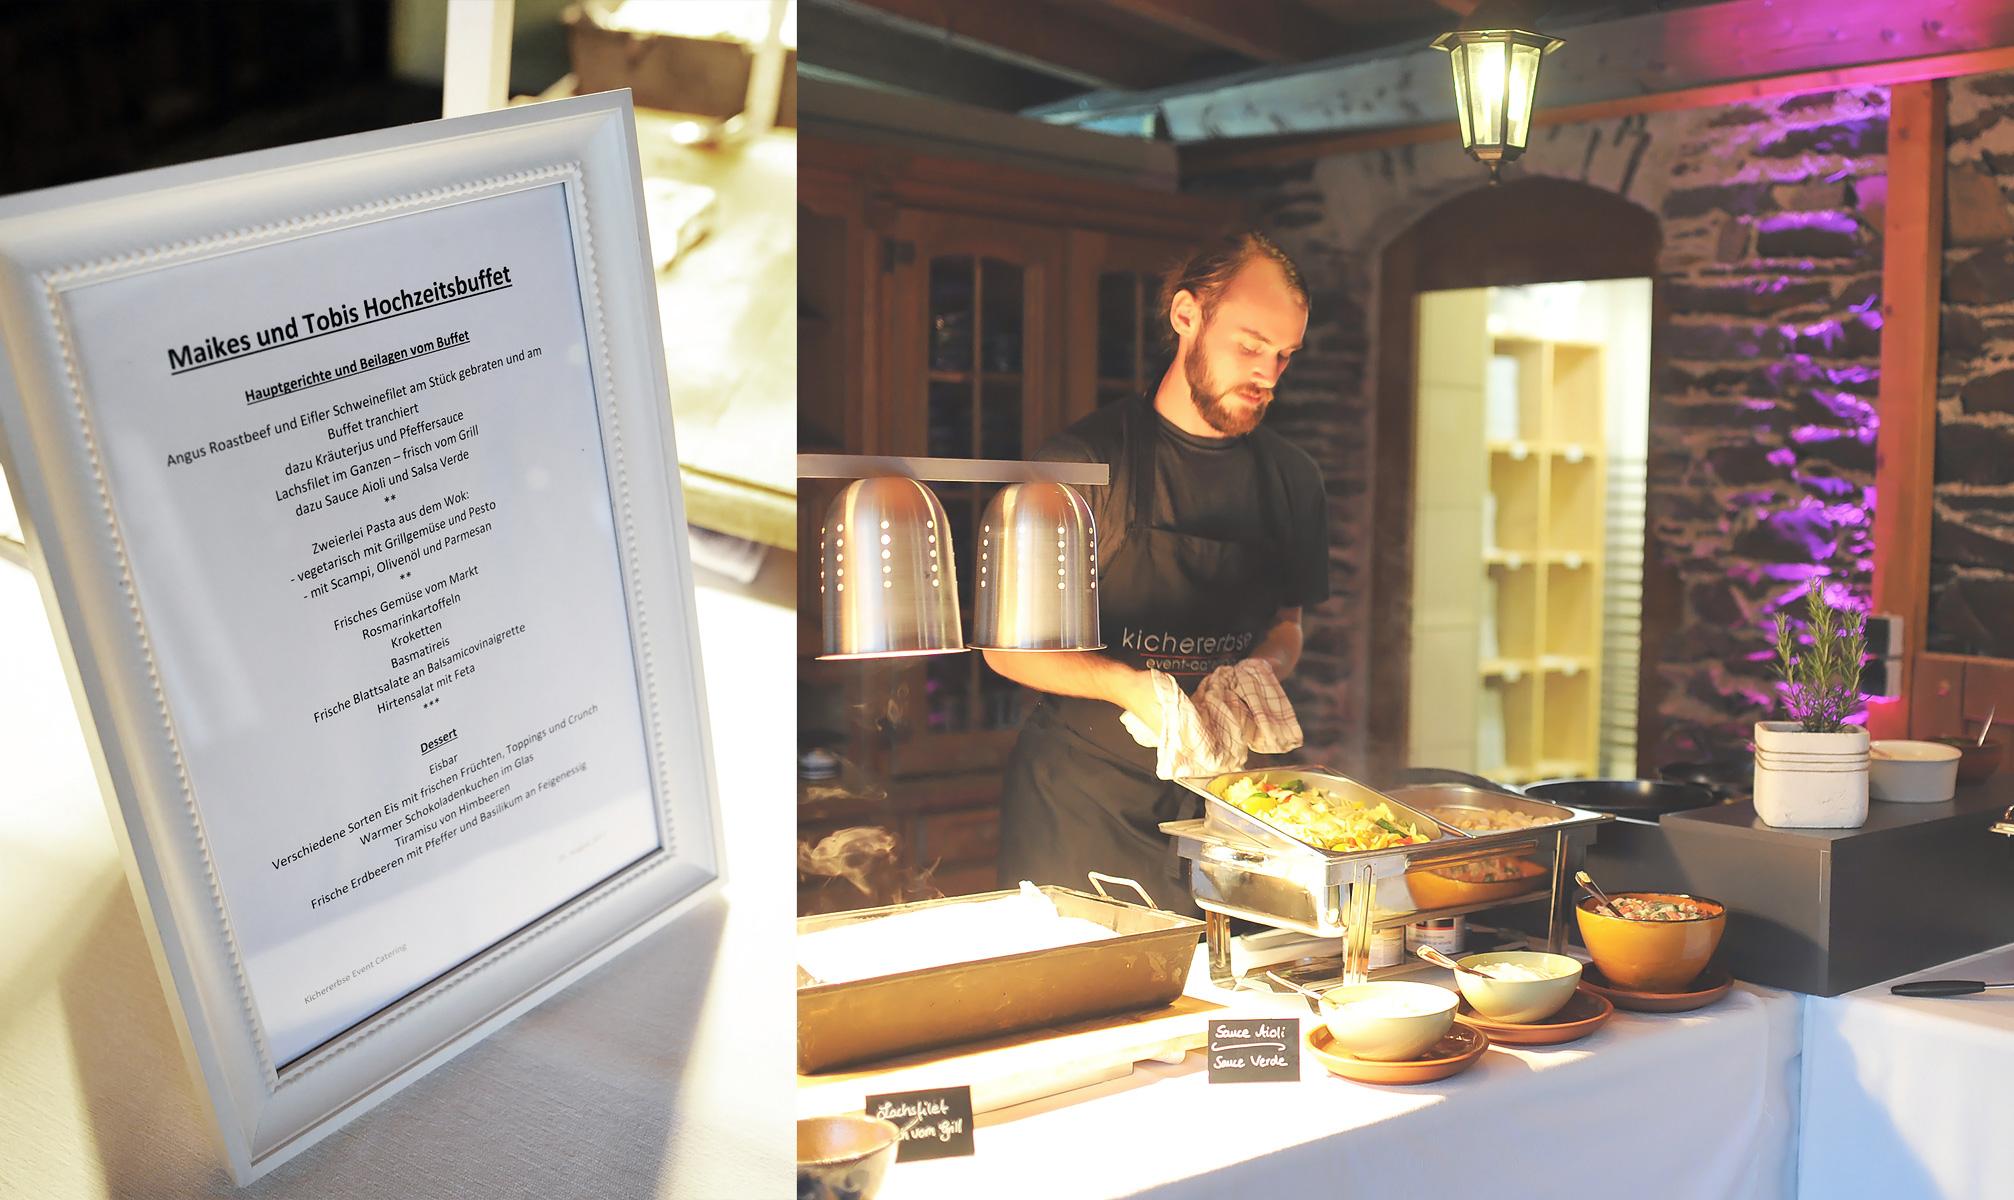 kichererbse-catering-nicole-bouillon-fotografie.jpg